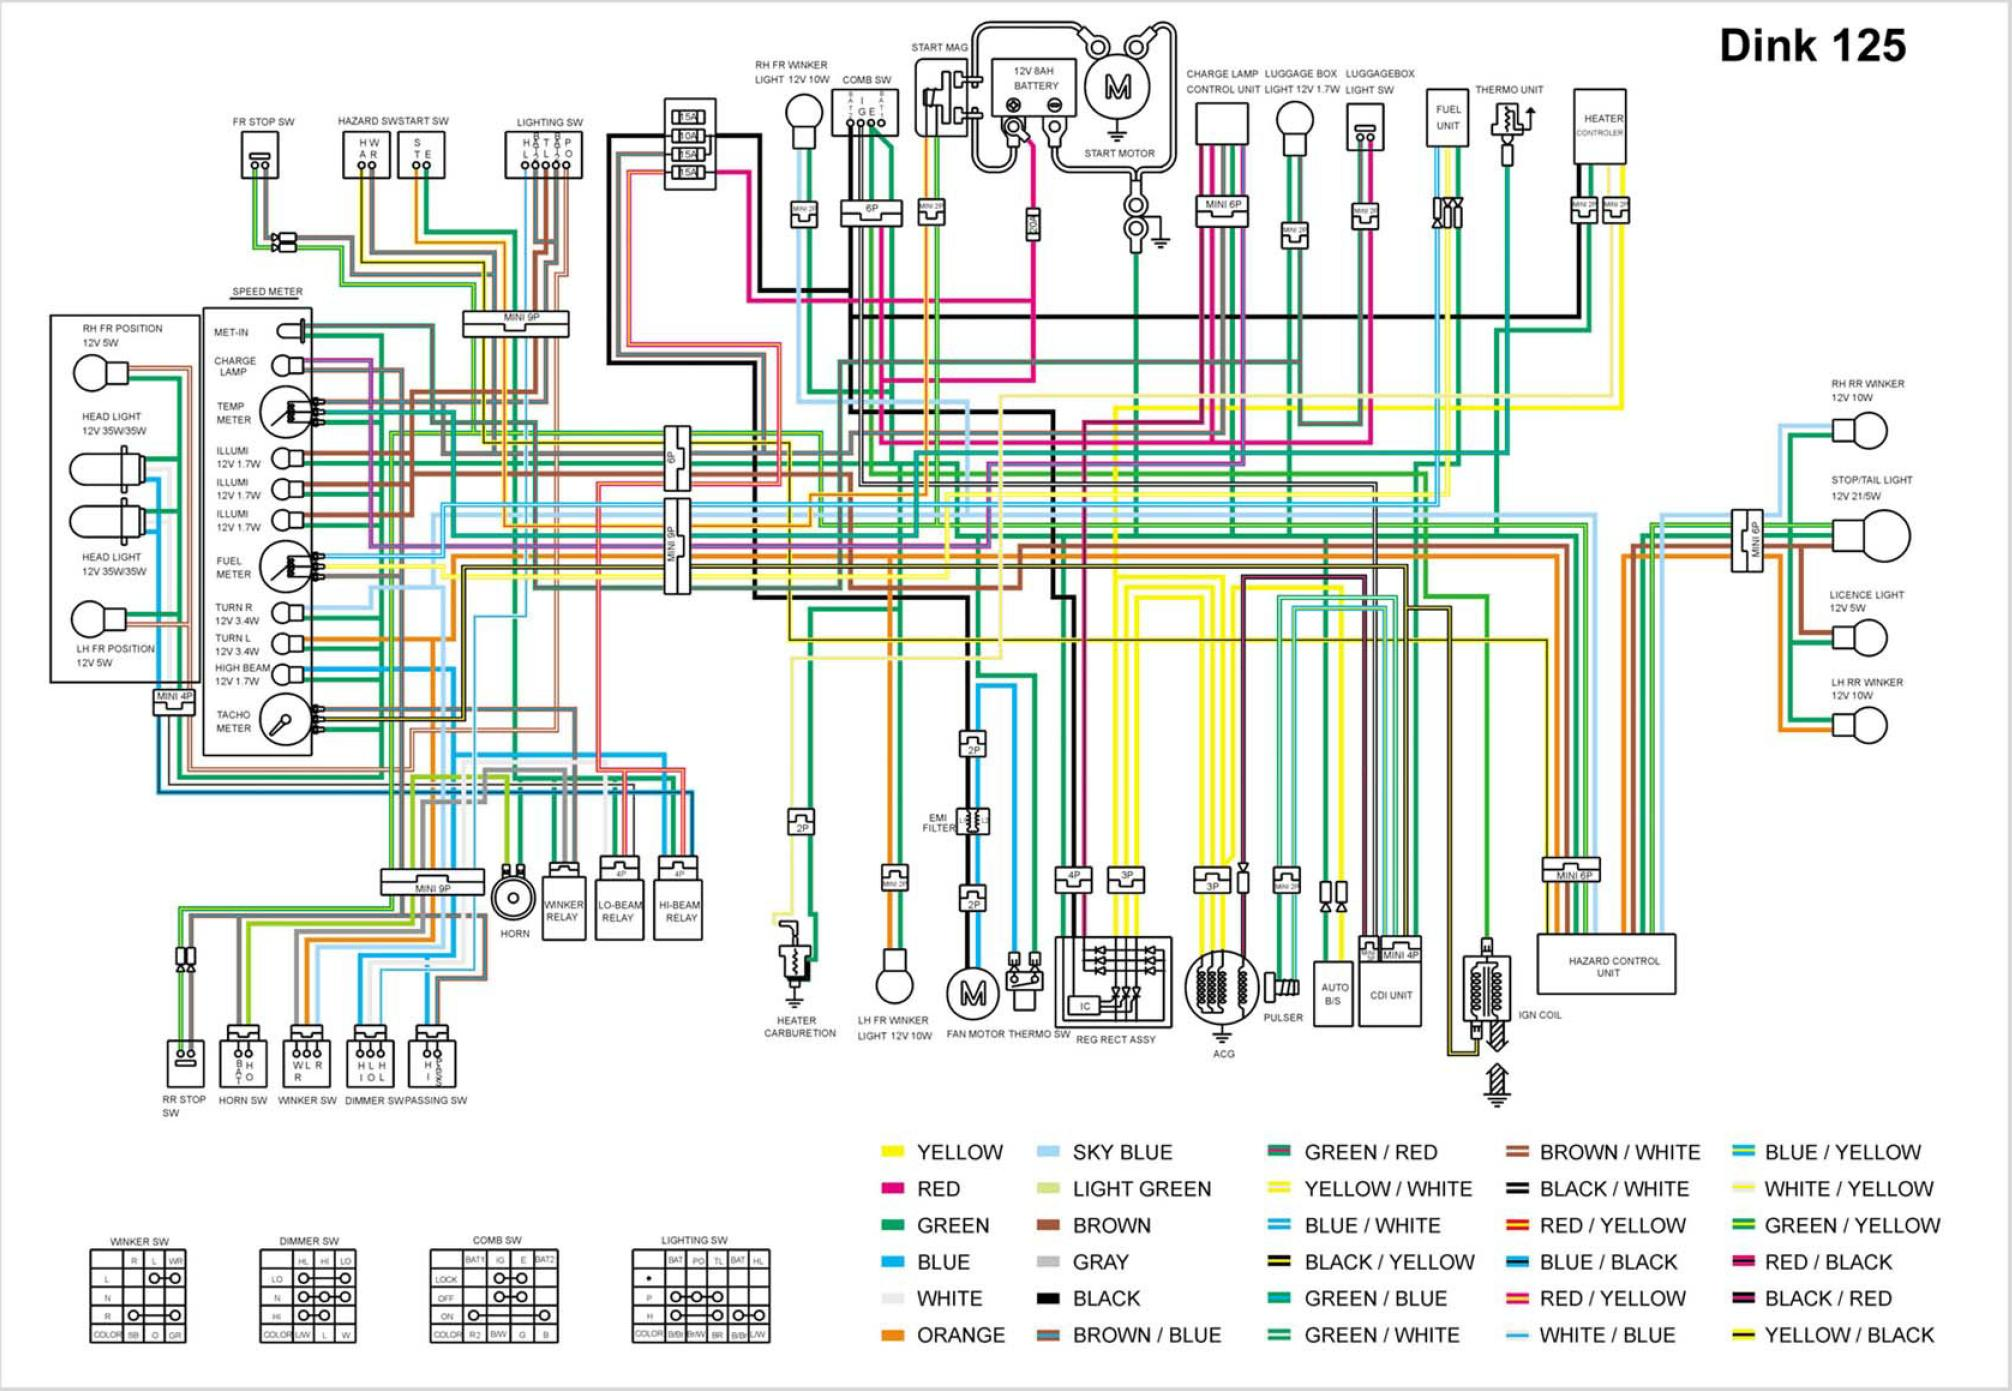 Kymco Agility 125 Wiring Diagram Schema Wiring Diagrams Kymco Agility 50  Top Speed Kymco Agility 125 Wiring Diagram